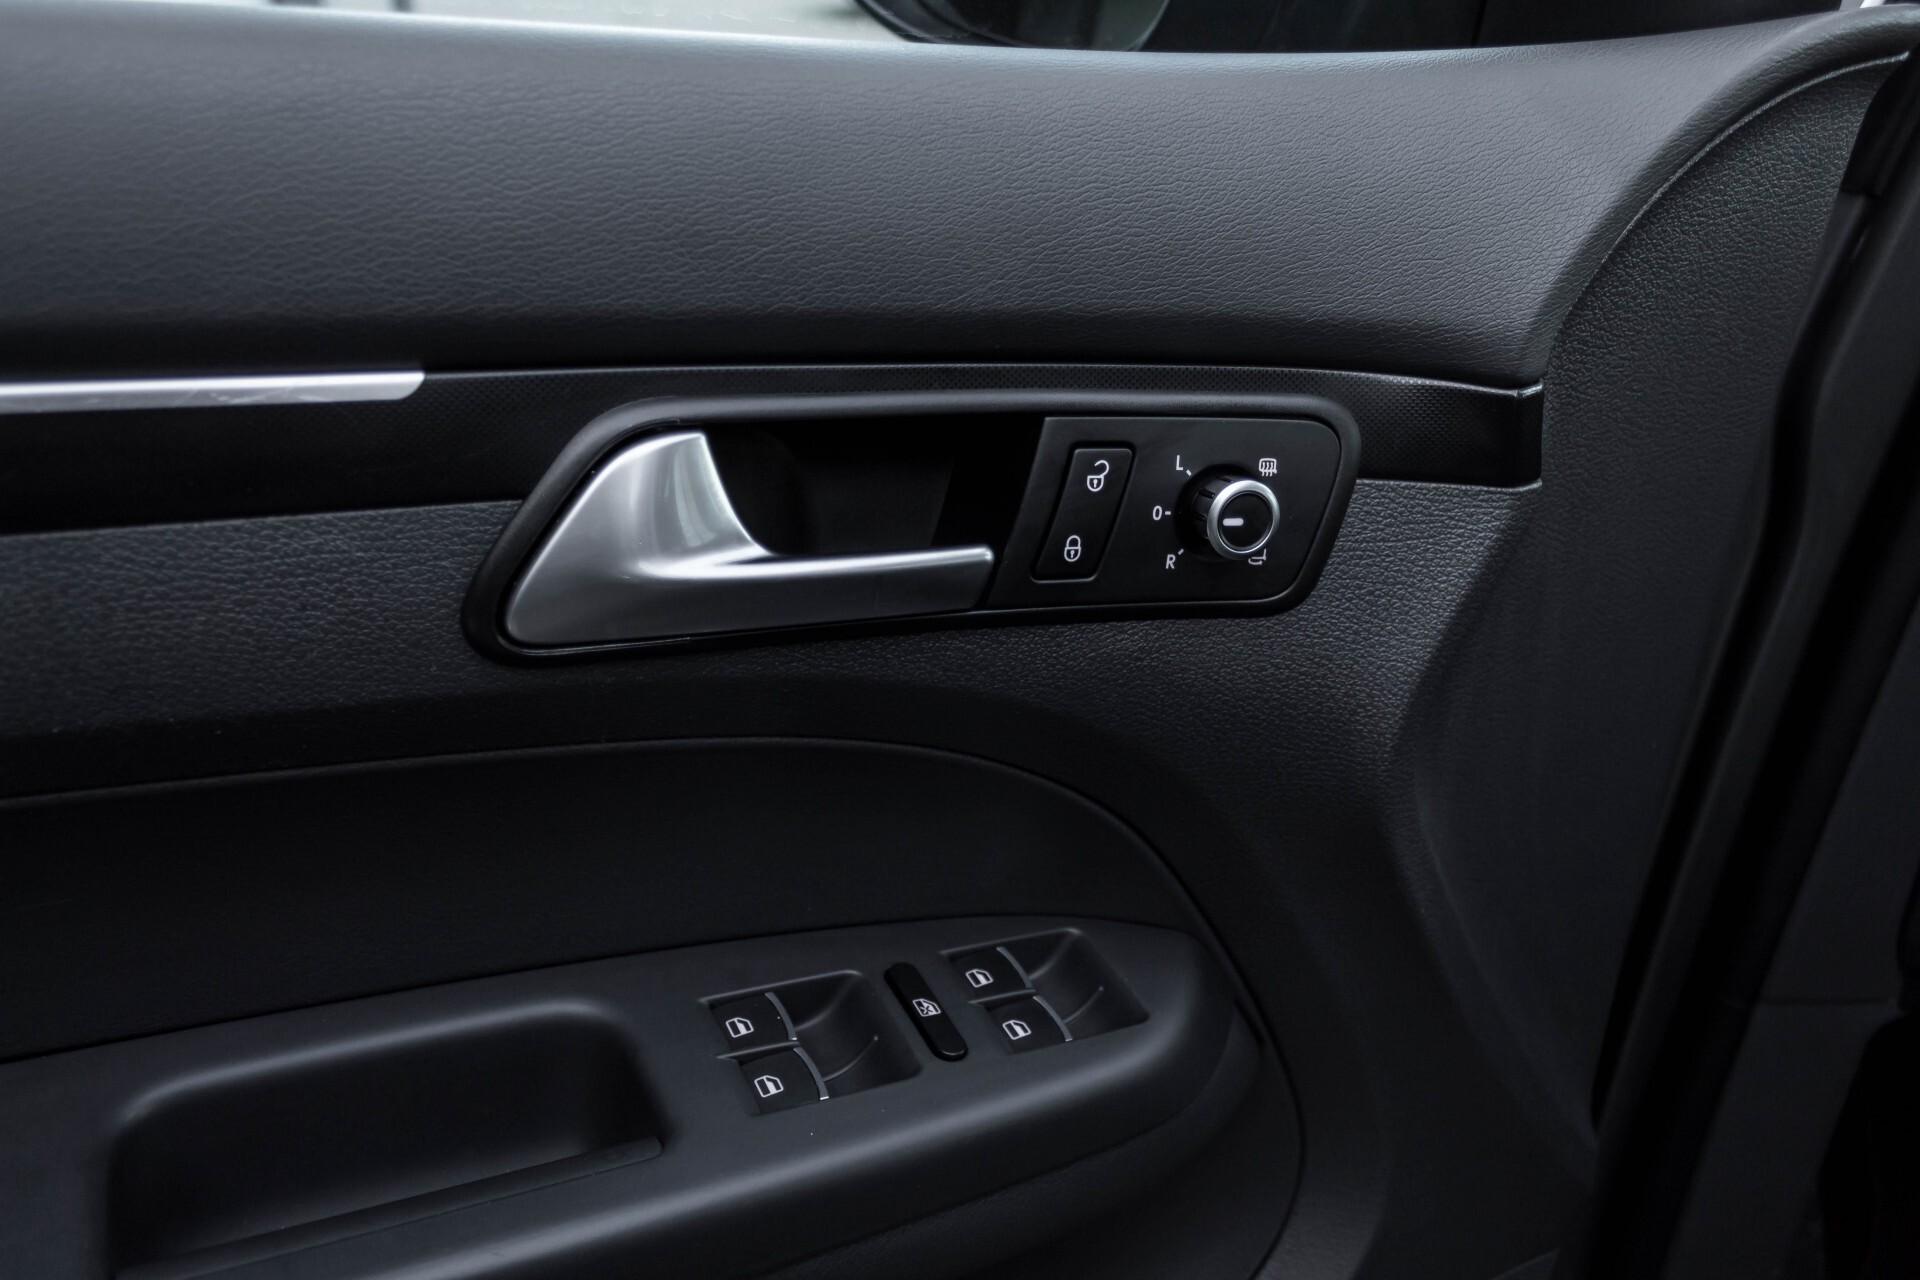 Volkswagen Touran 2.0 TDI Highline 7Persoons 177pk Panorama/Leder/Navi/Camera/Verw-Stln/Trhk/ECC/Xenon Aut Foto 32